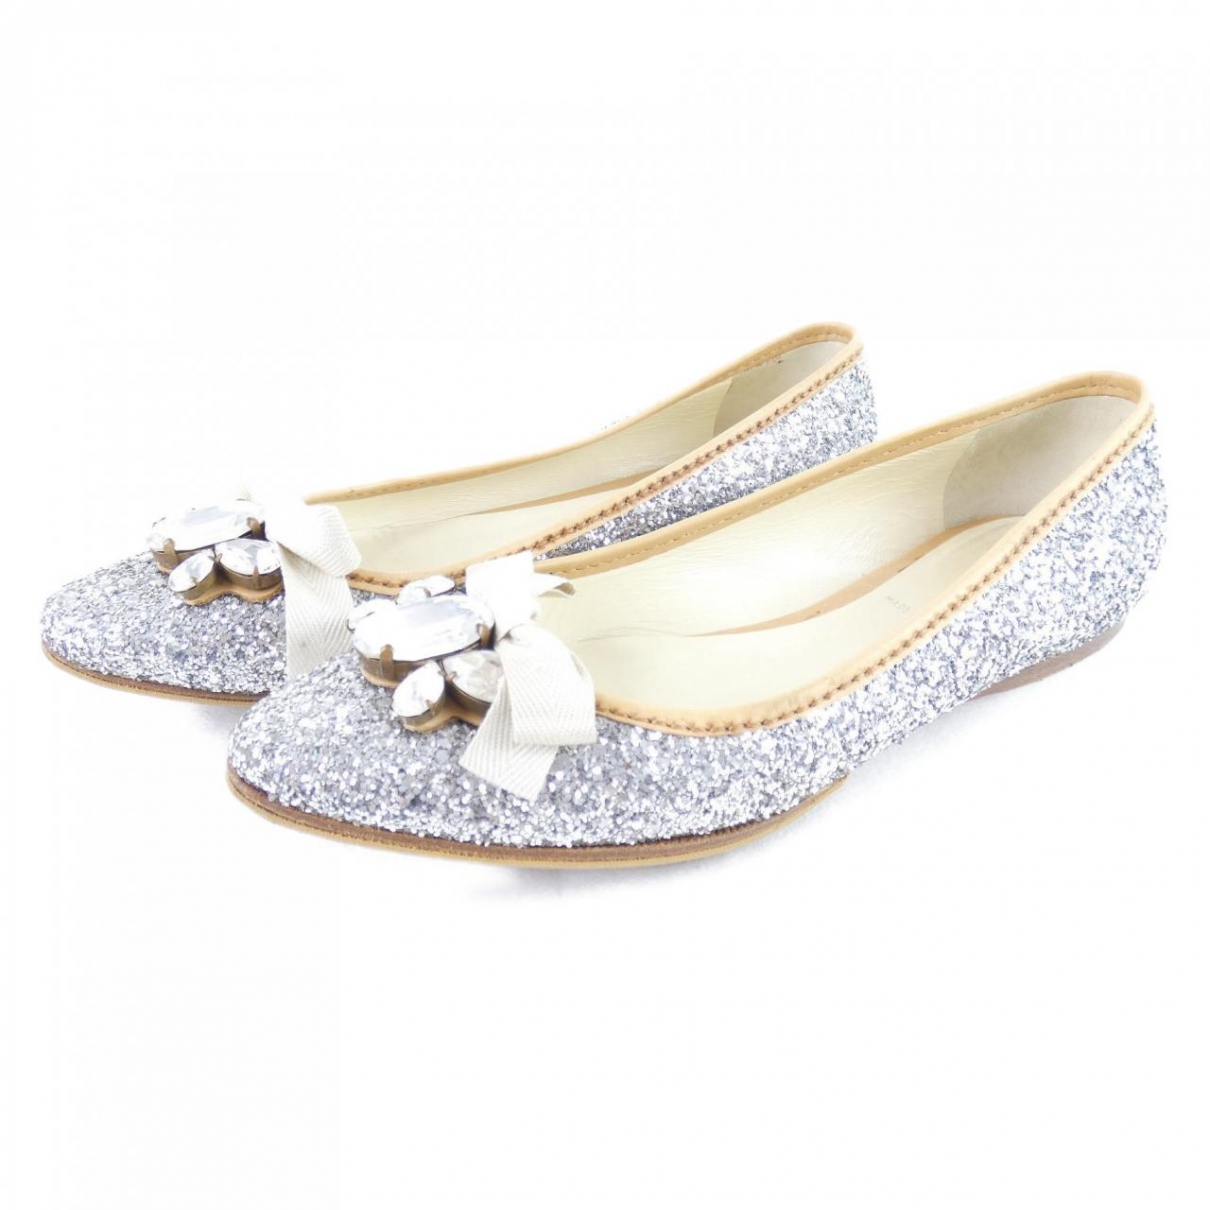 Miu Miu \N Silver Glitter Ballet flats for Women 36 EU